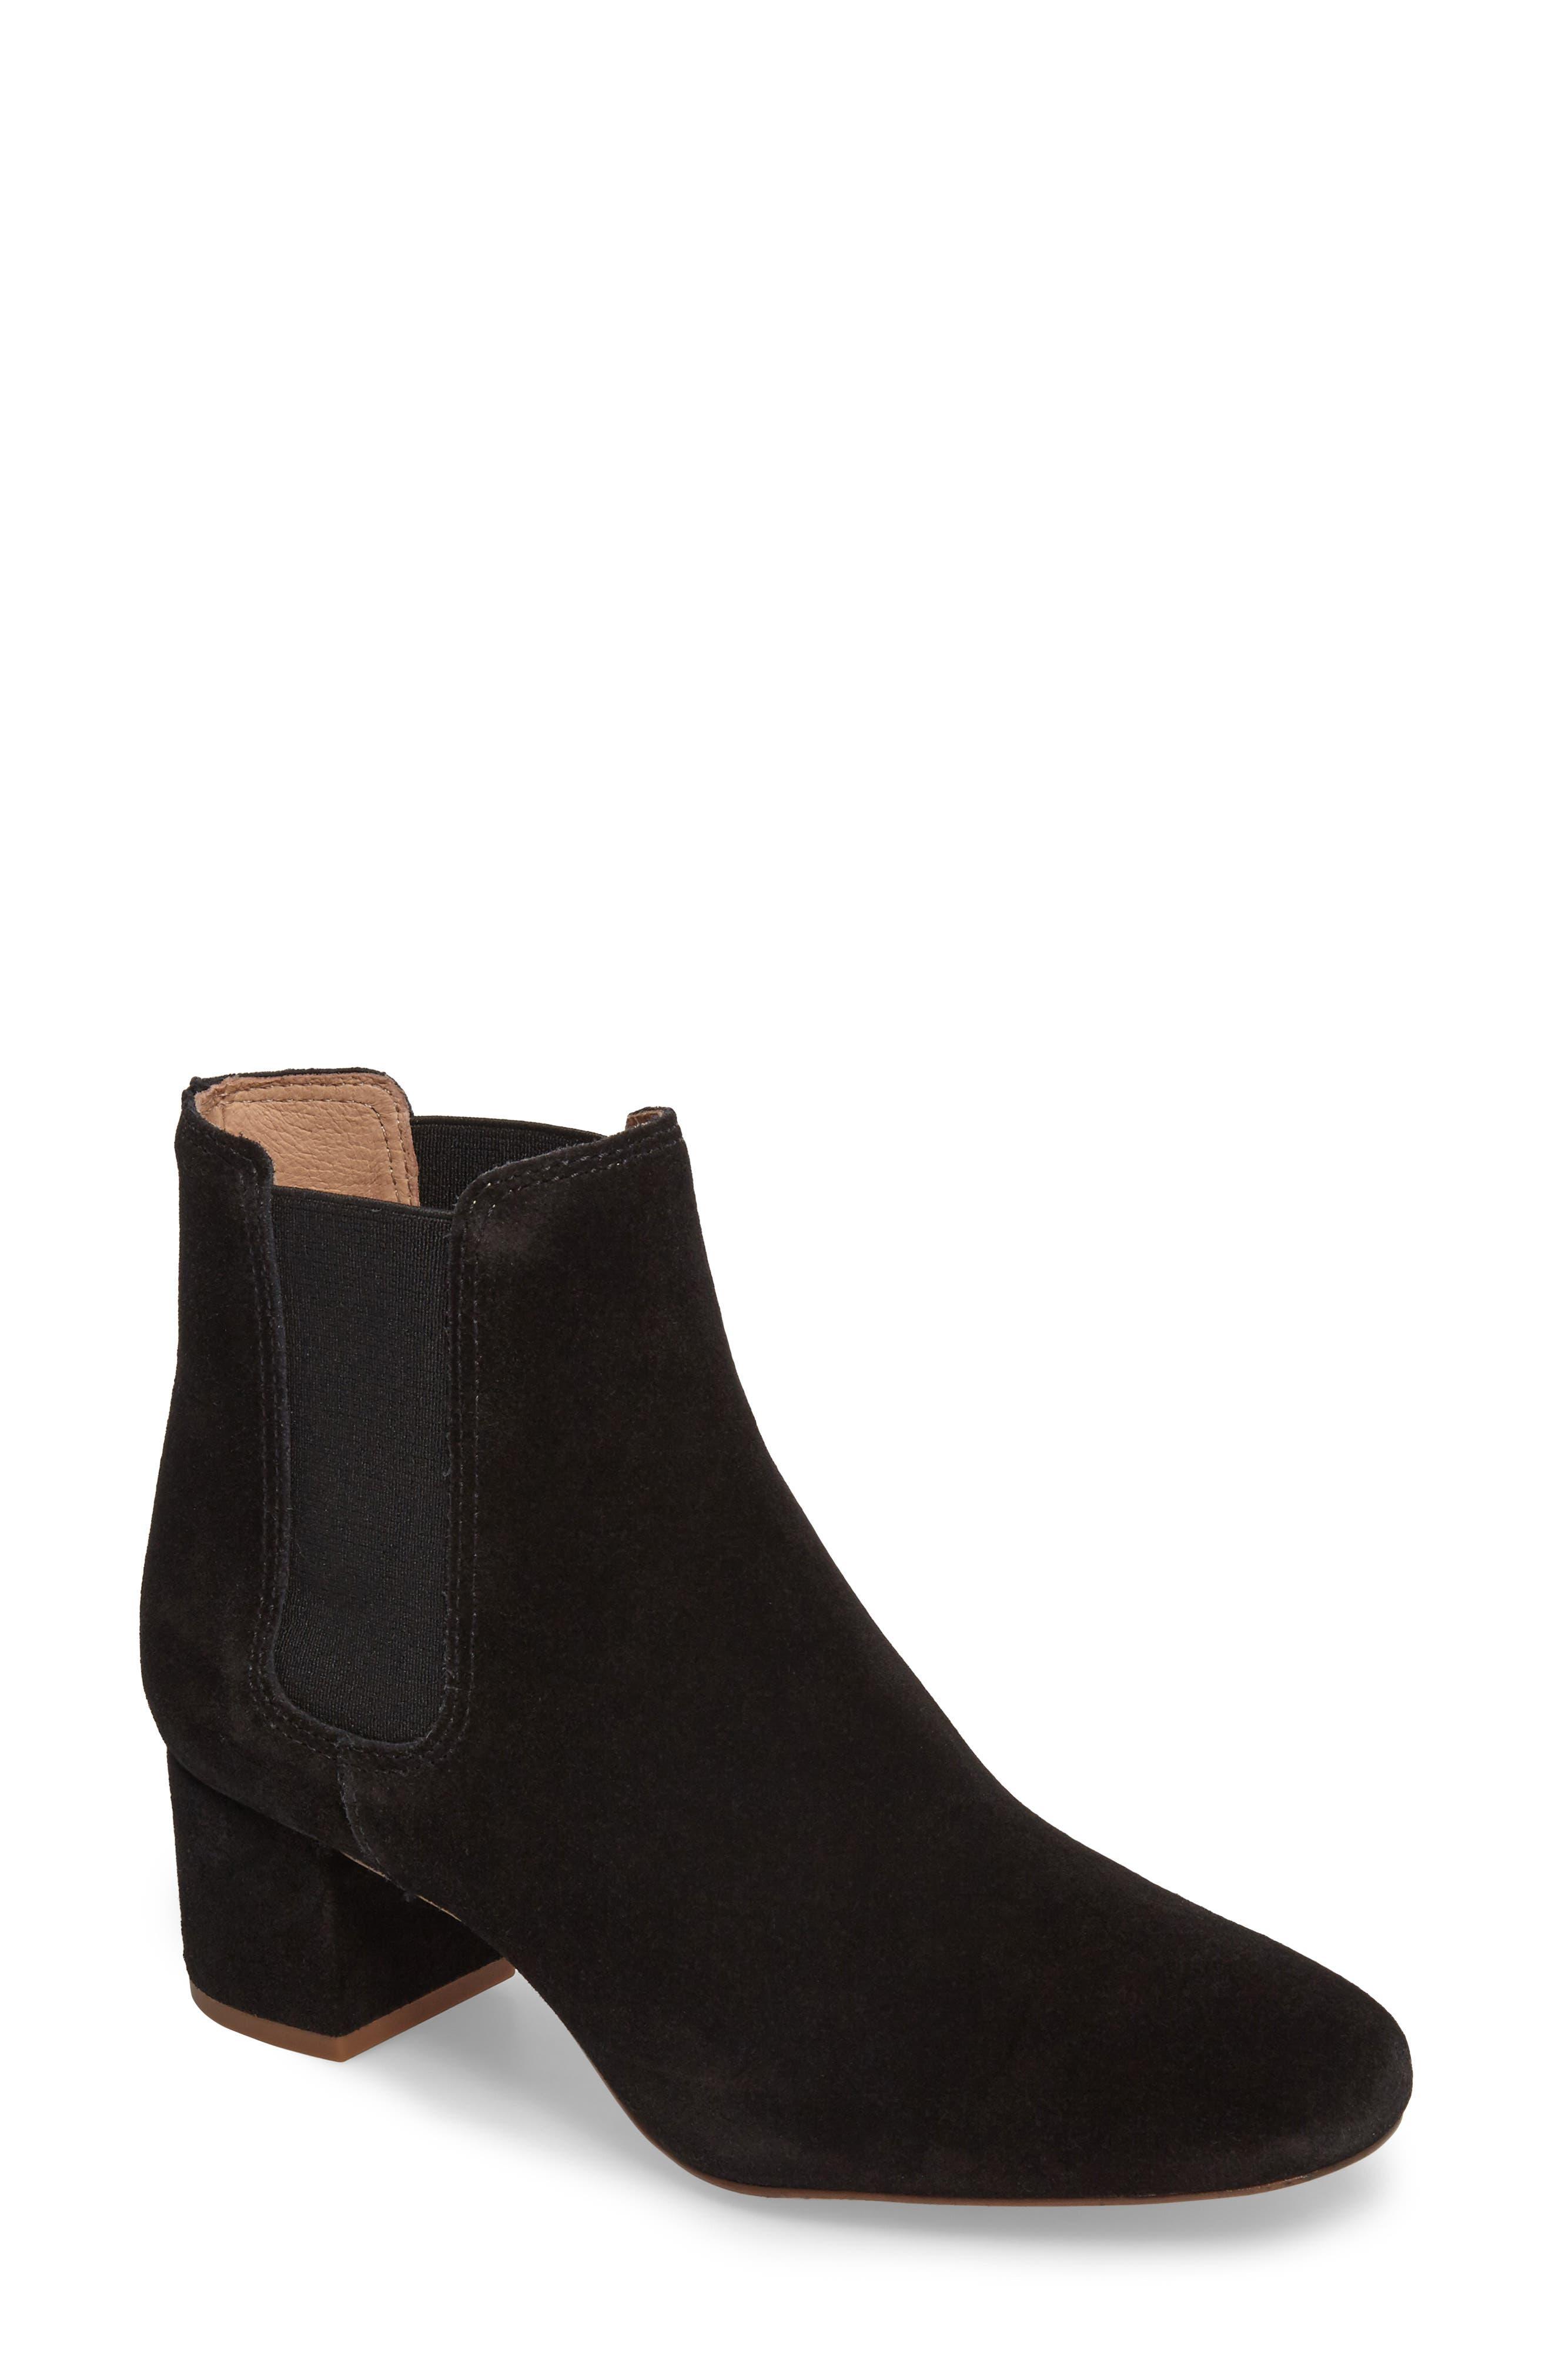 Main Image - Madewell Walker Chelsea Boot (Women)